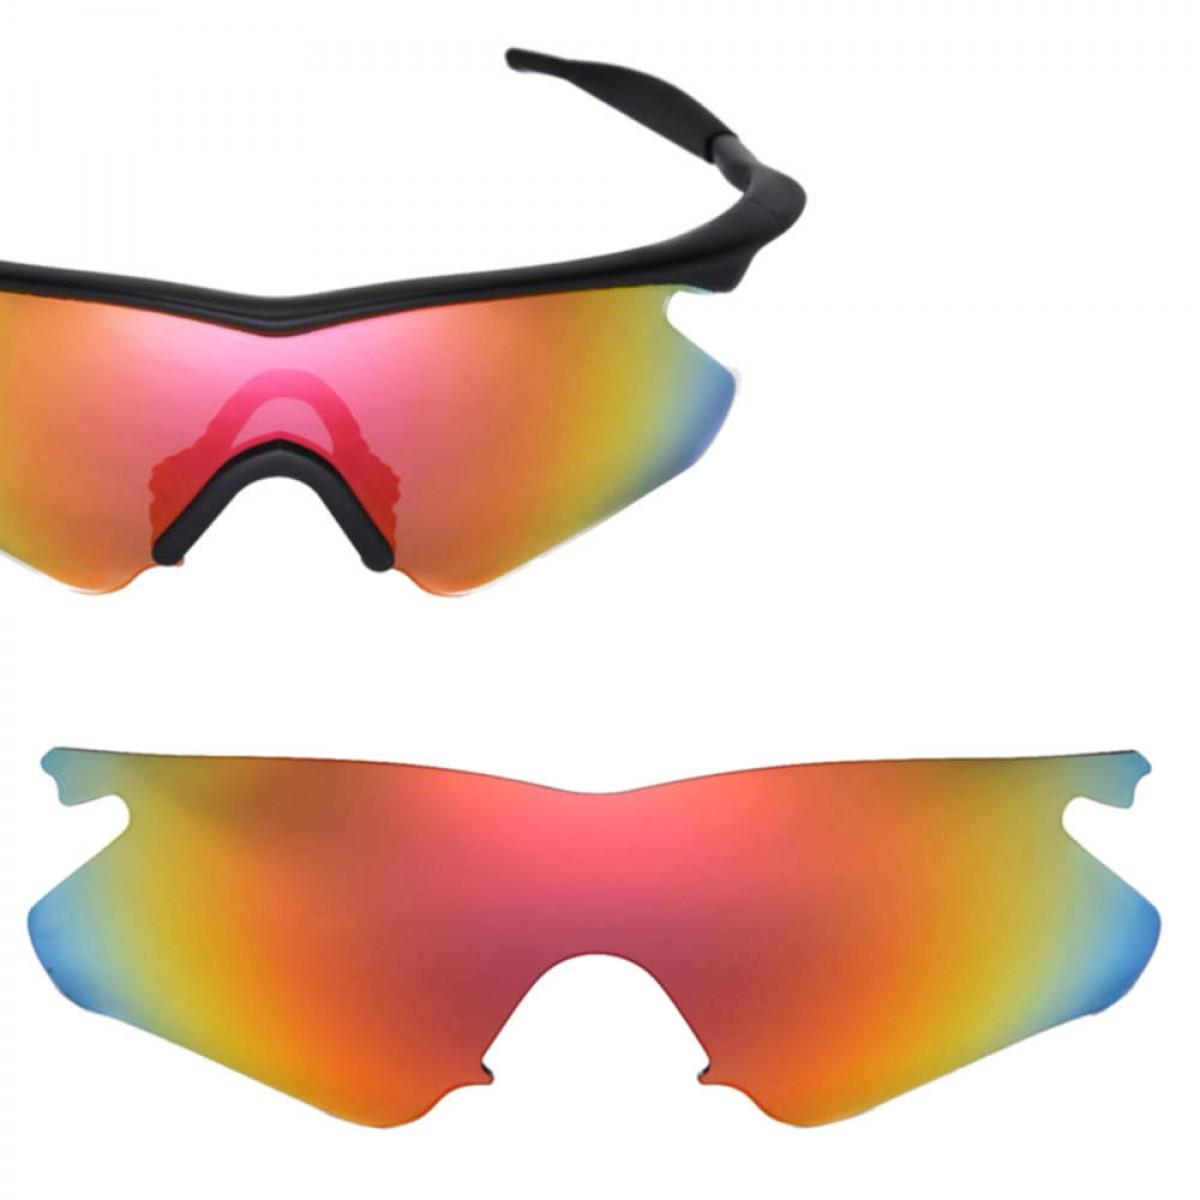 c0d2f5cbdf Cofery Lenses Store Cofery Replacement Lenses for Oakley M Frame Heater  Sunglasses